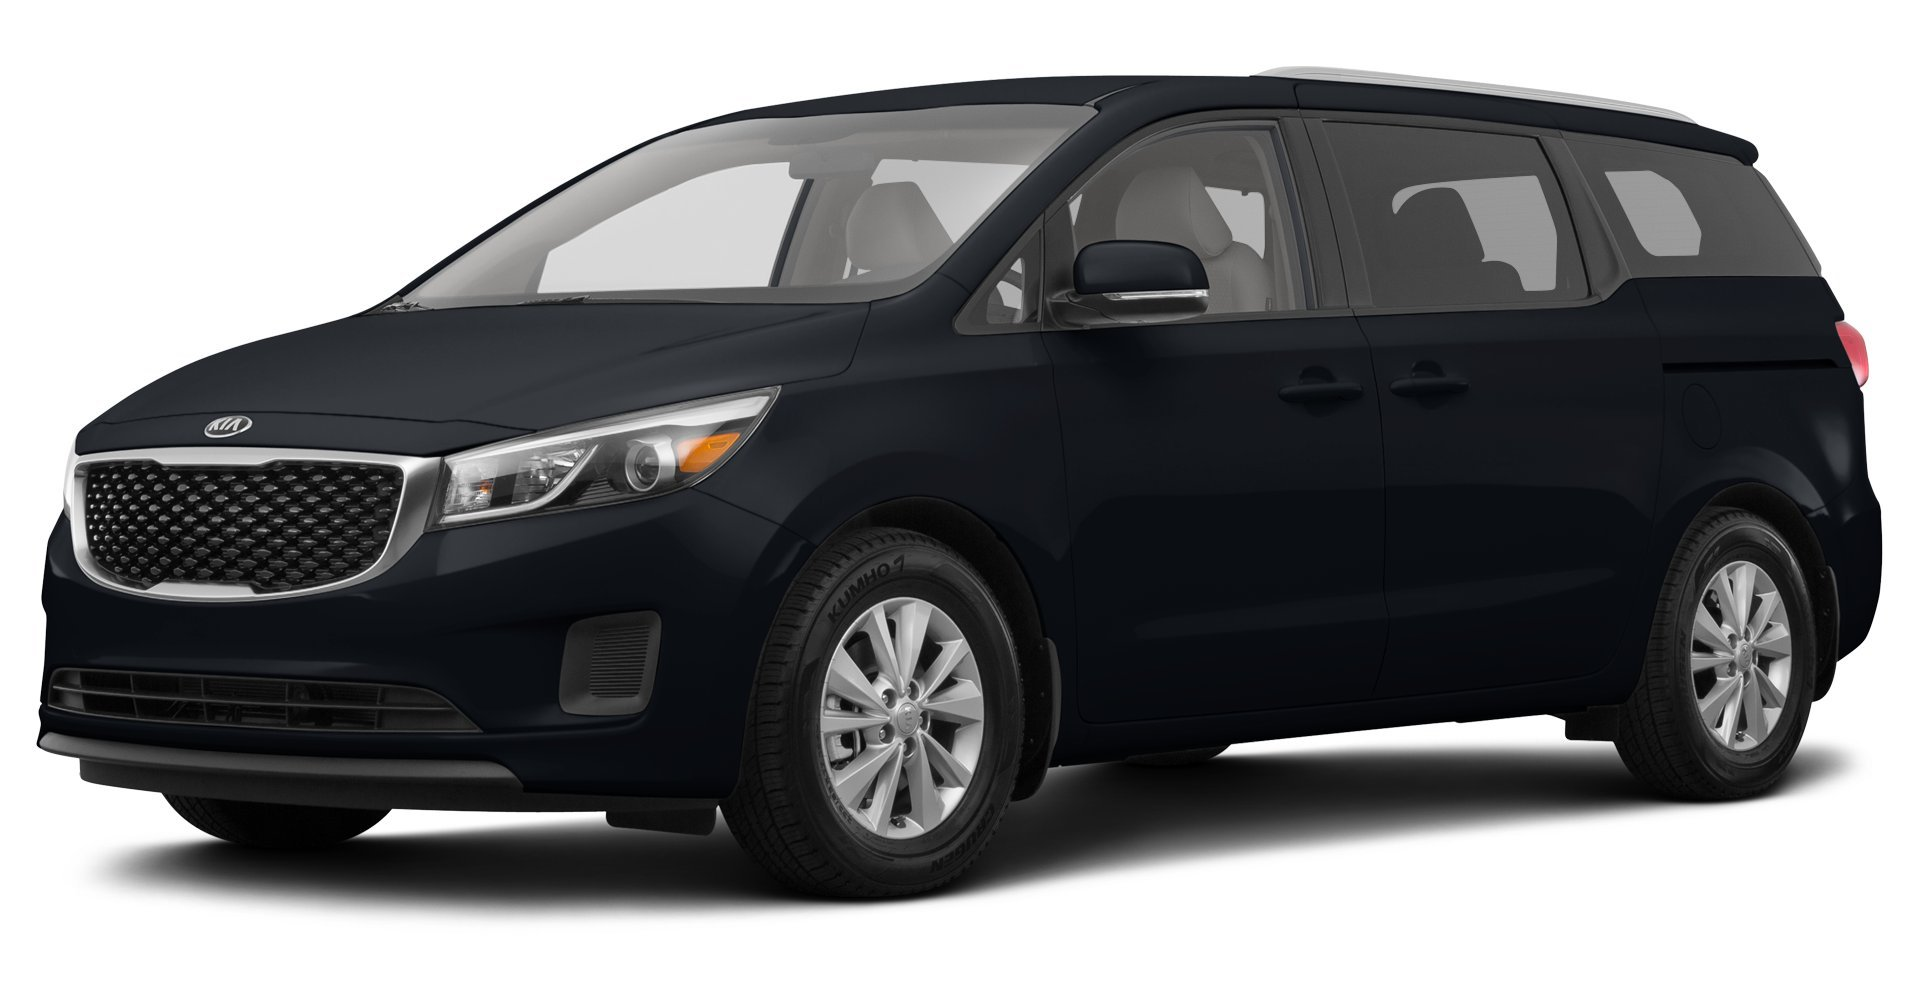 2017 kia sedona reviews images and specs vehicles. Black Bedroom Furniture Sets. Home Design Ideas